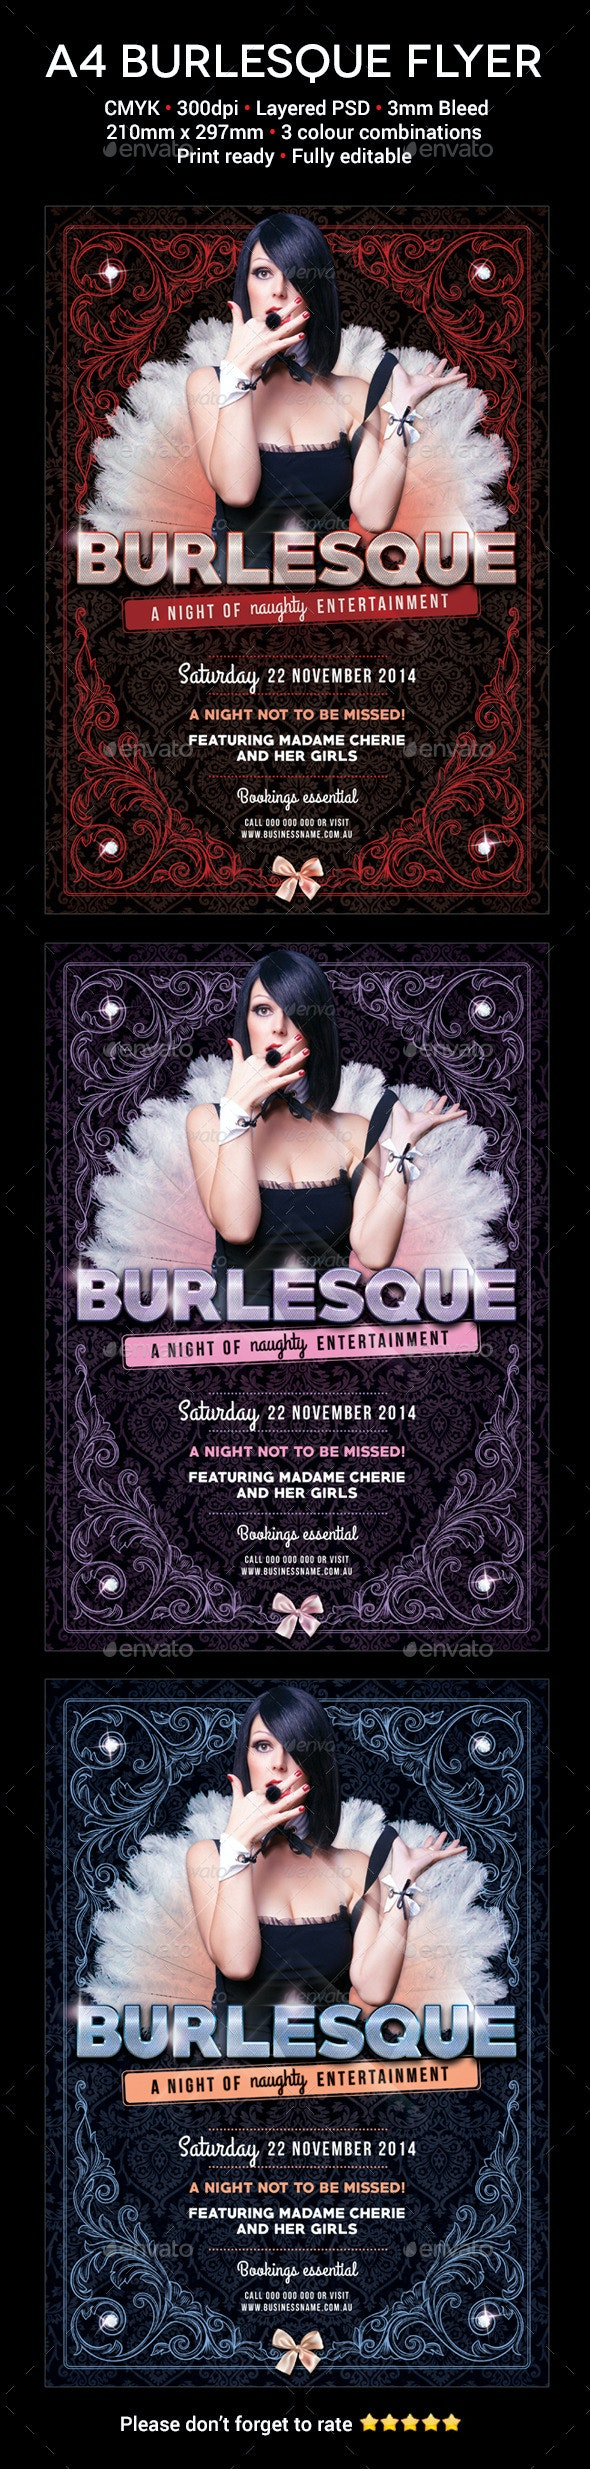 Burlesque A4 Flyer - Flyers Print Templates